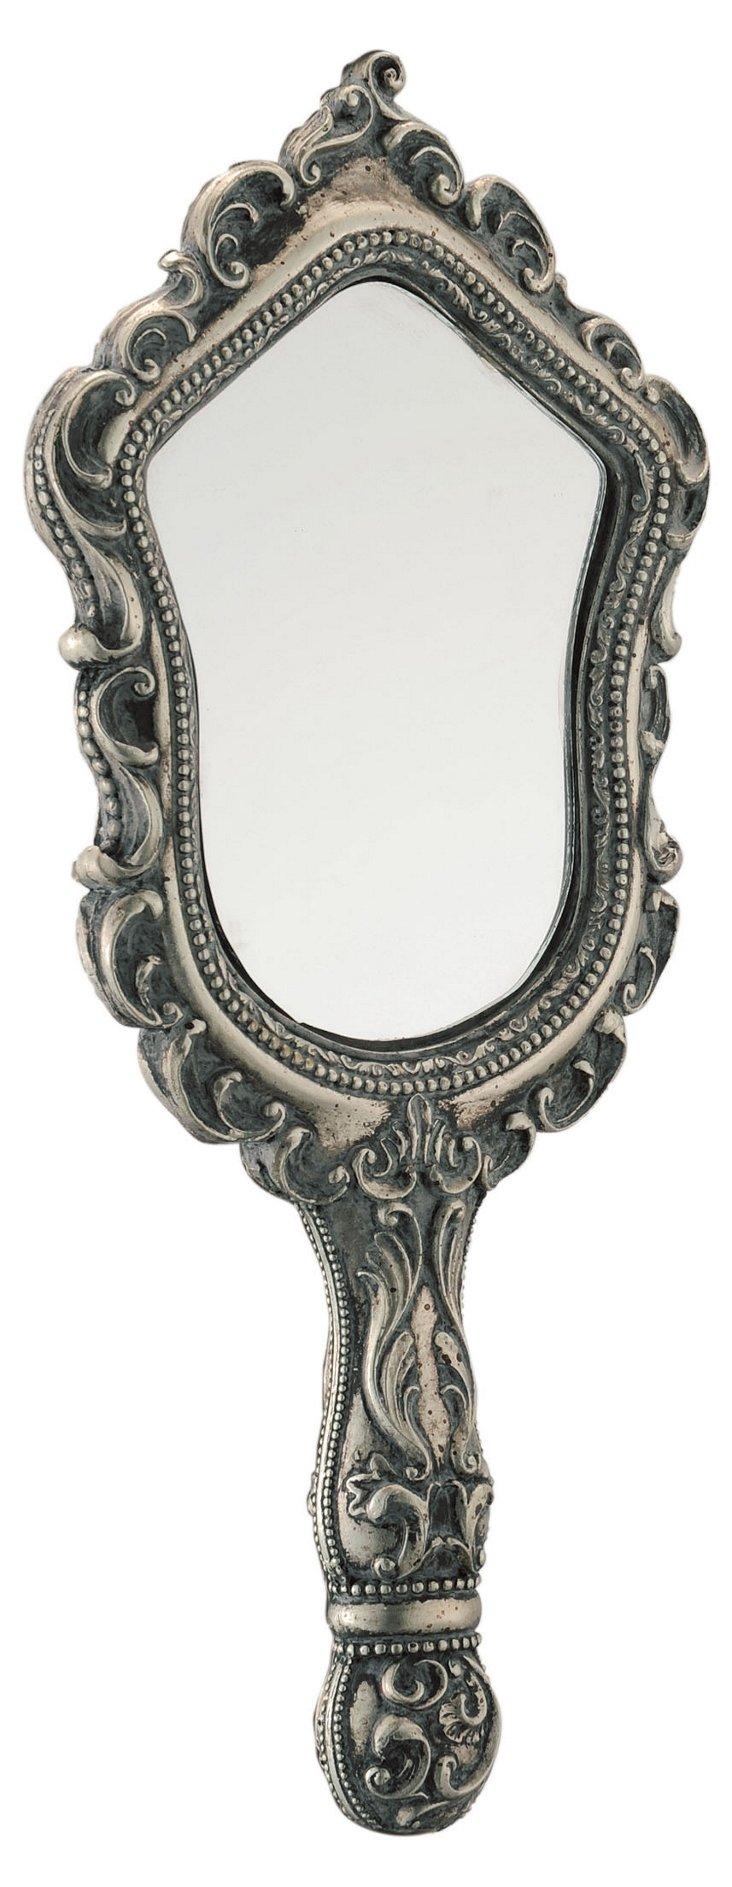 "11"" Embellished Hand Mirror"